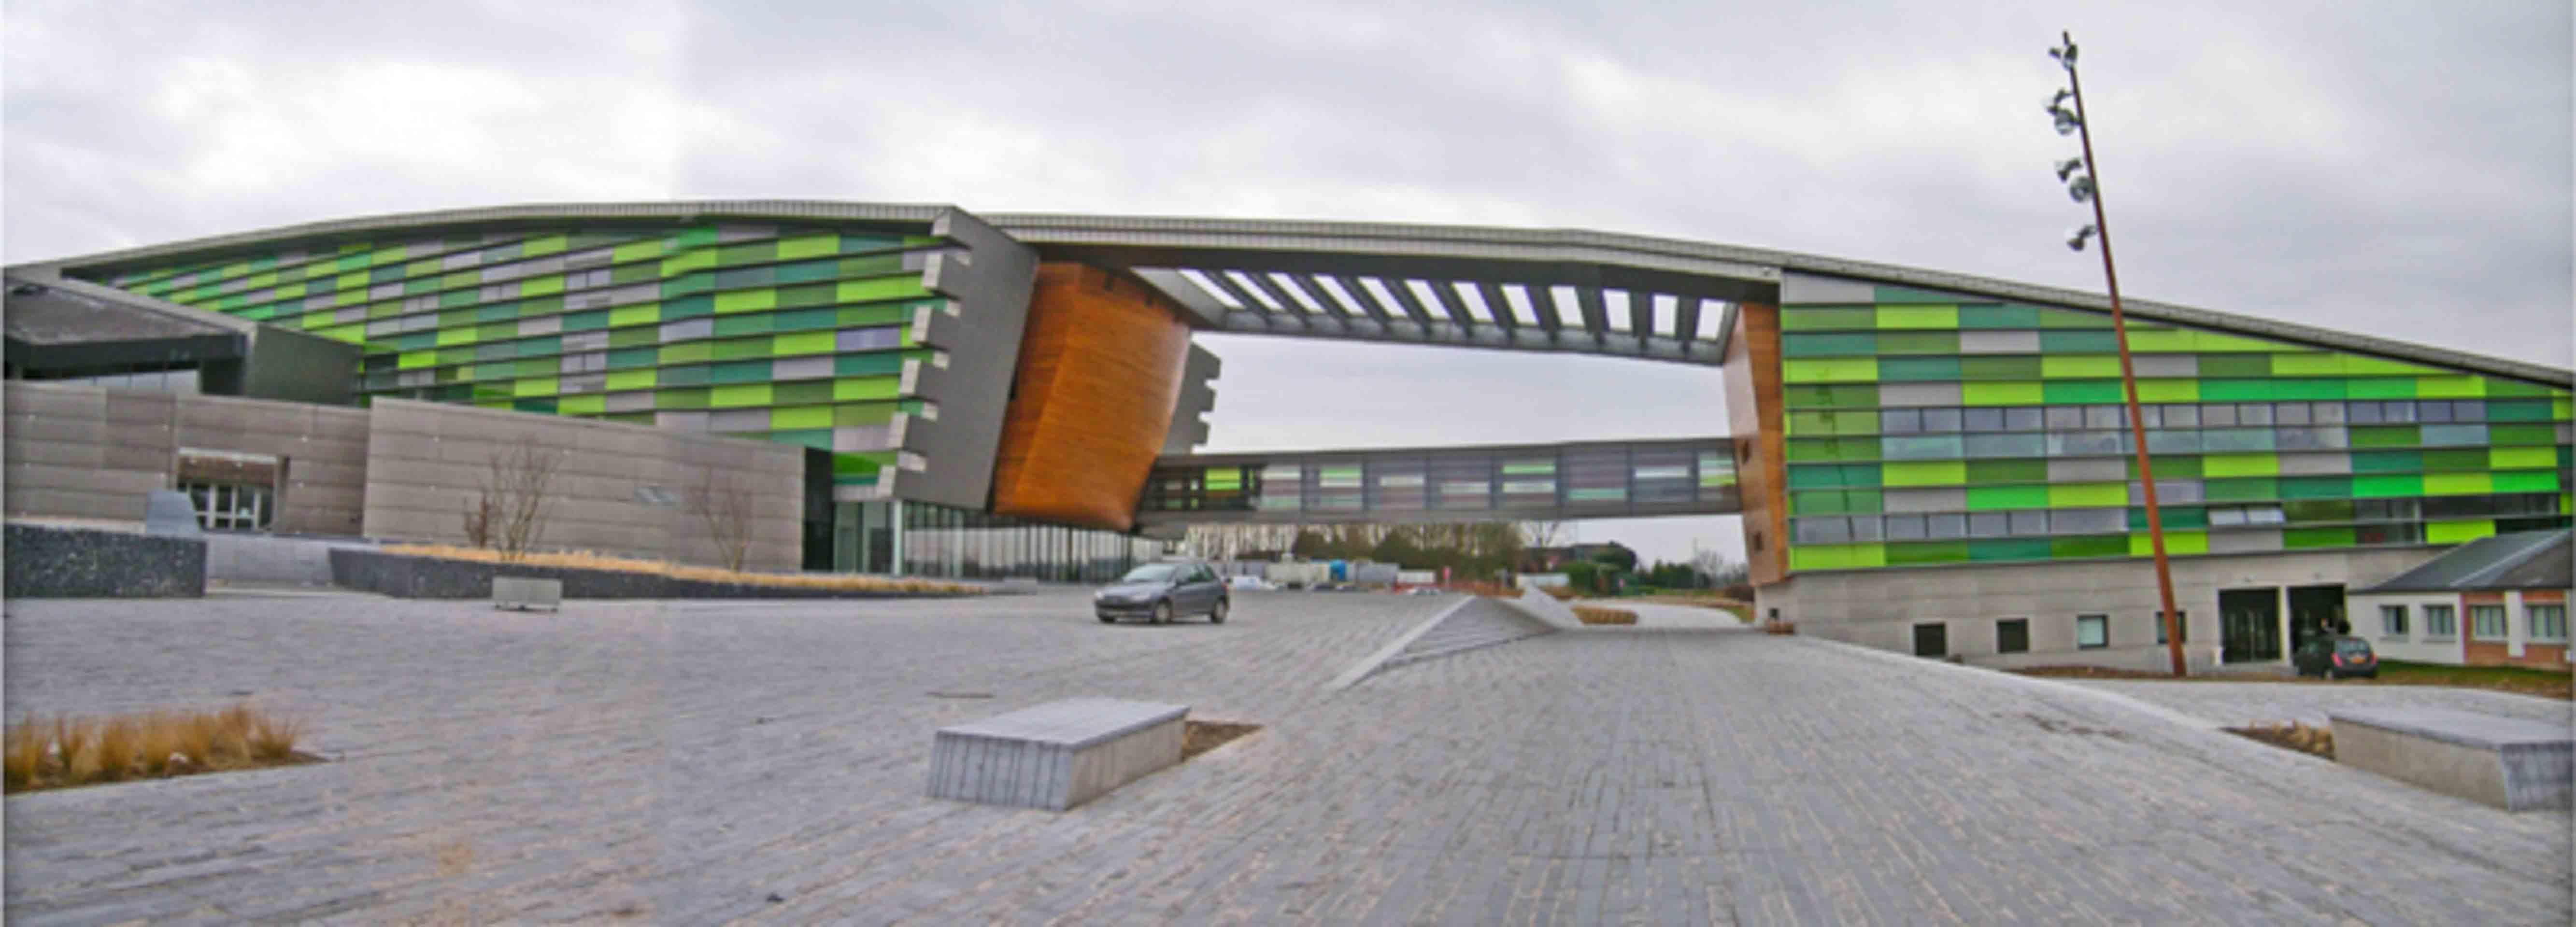 Liévin - Complexe sportif et culturel